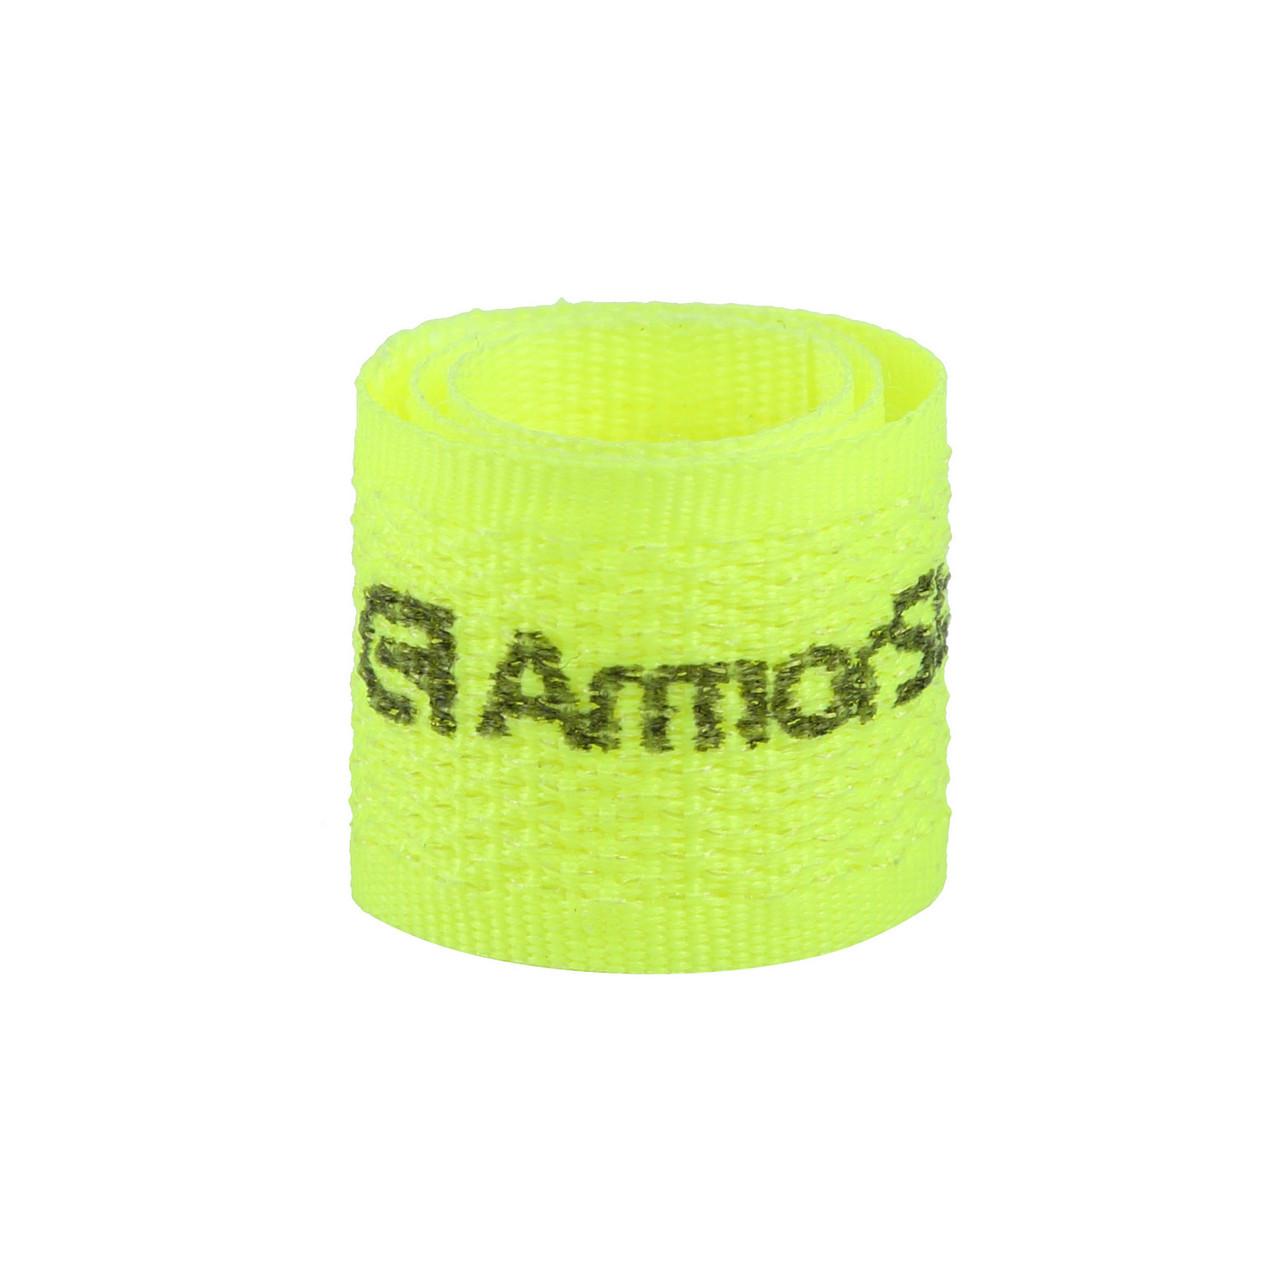 Органайзер-липучка для кабелей ArmorStandart Желтый (ARM53960)